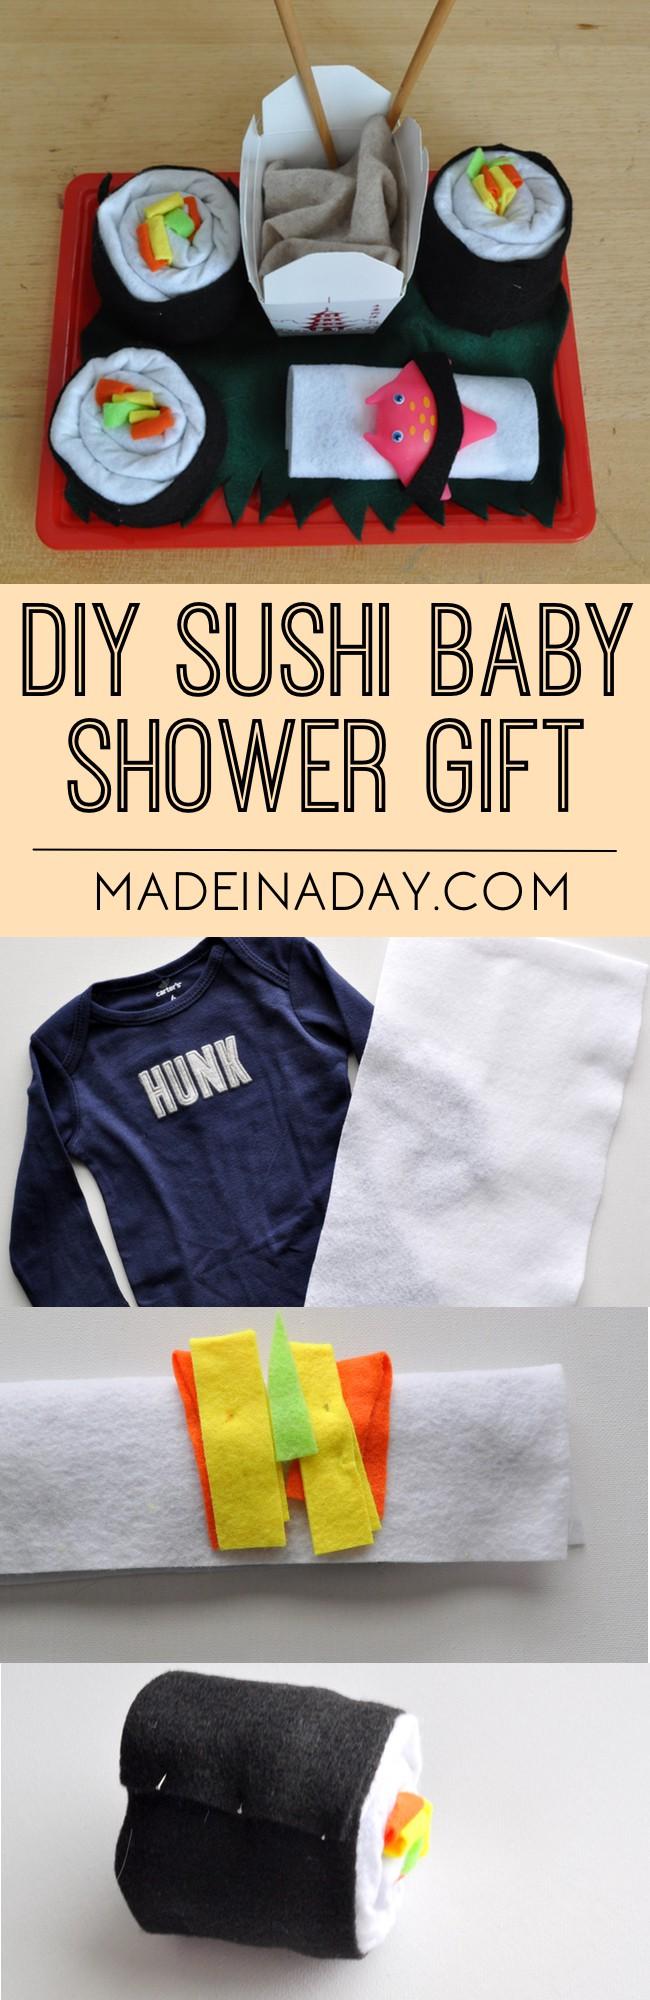 DIY Sushi Baby Shower Gift, Rolled fabric sushi, boy shower gift, cute baby gifts, takeout box gift,